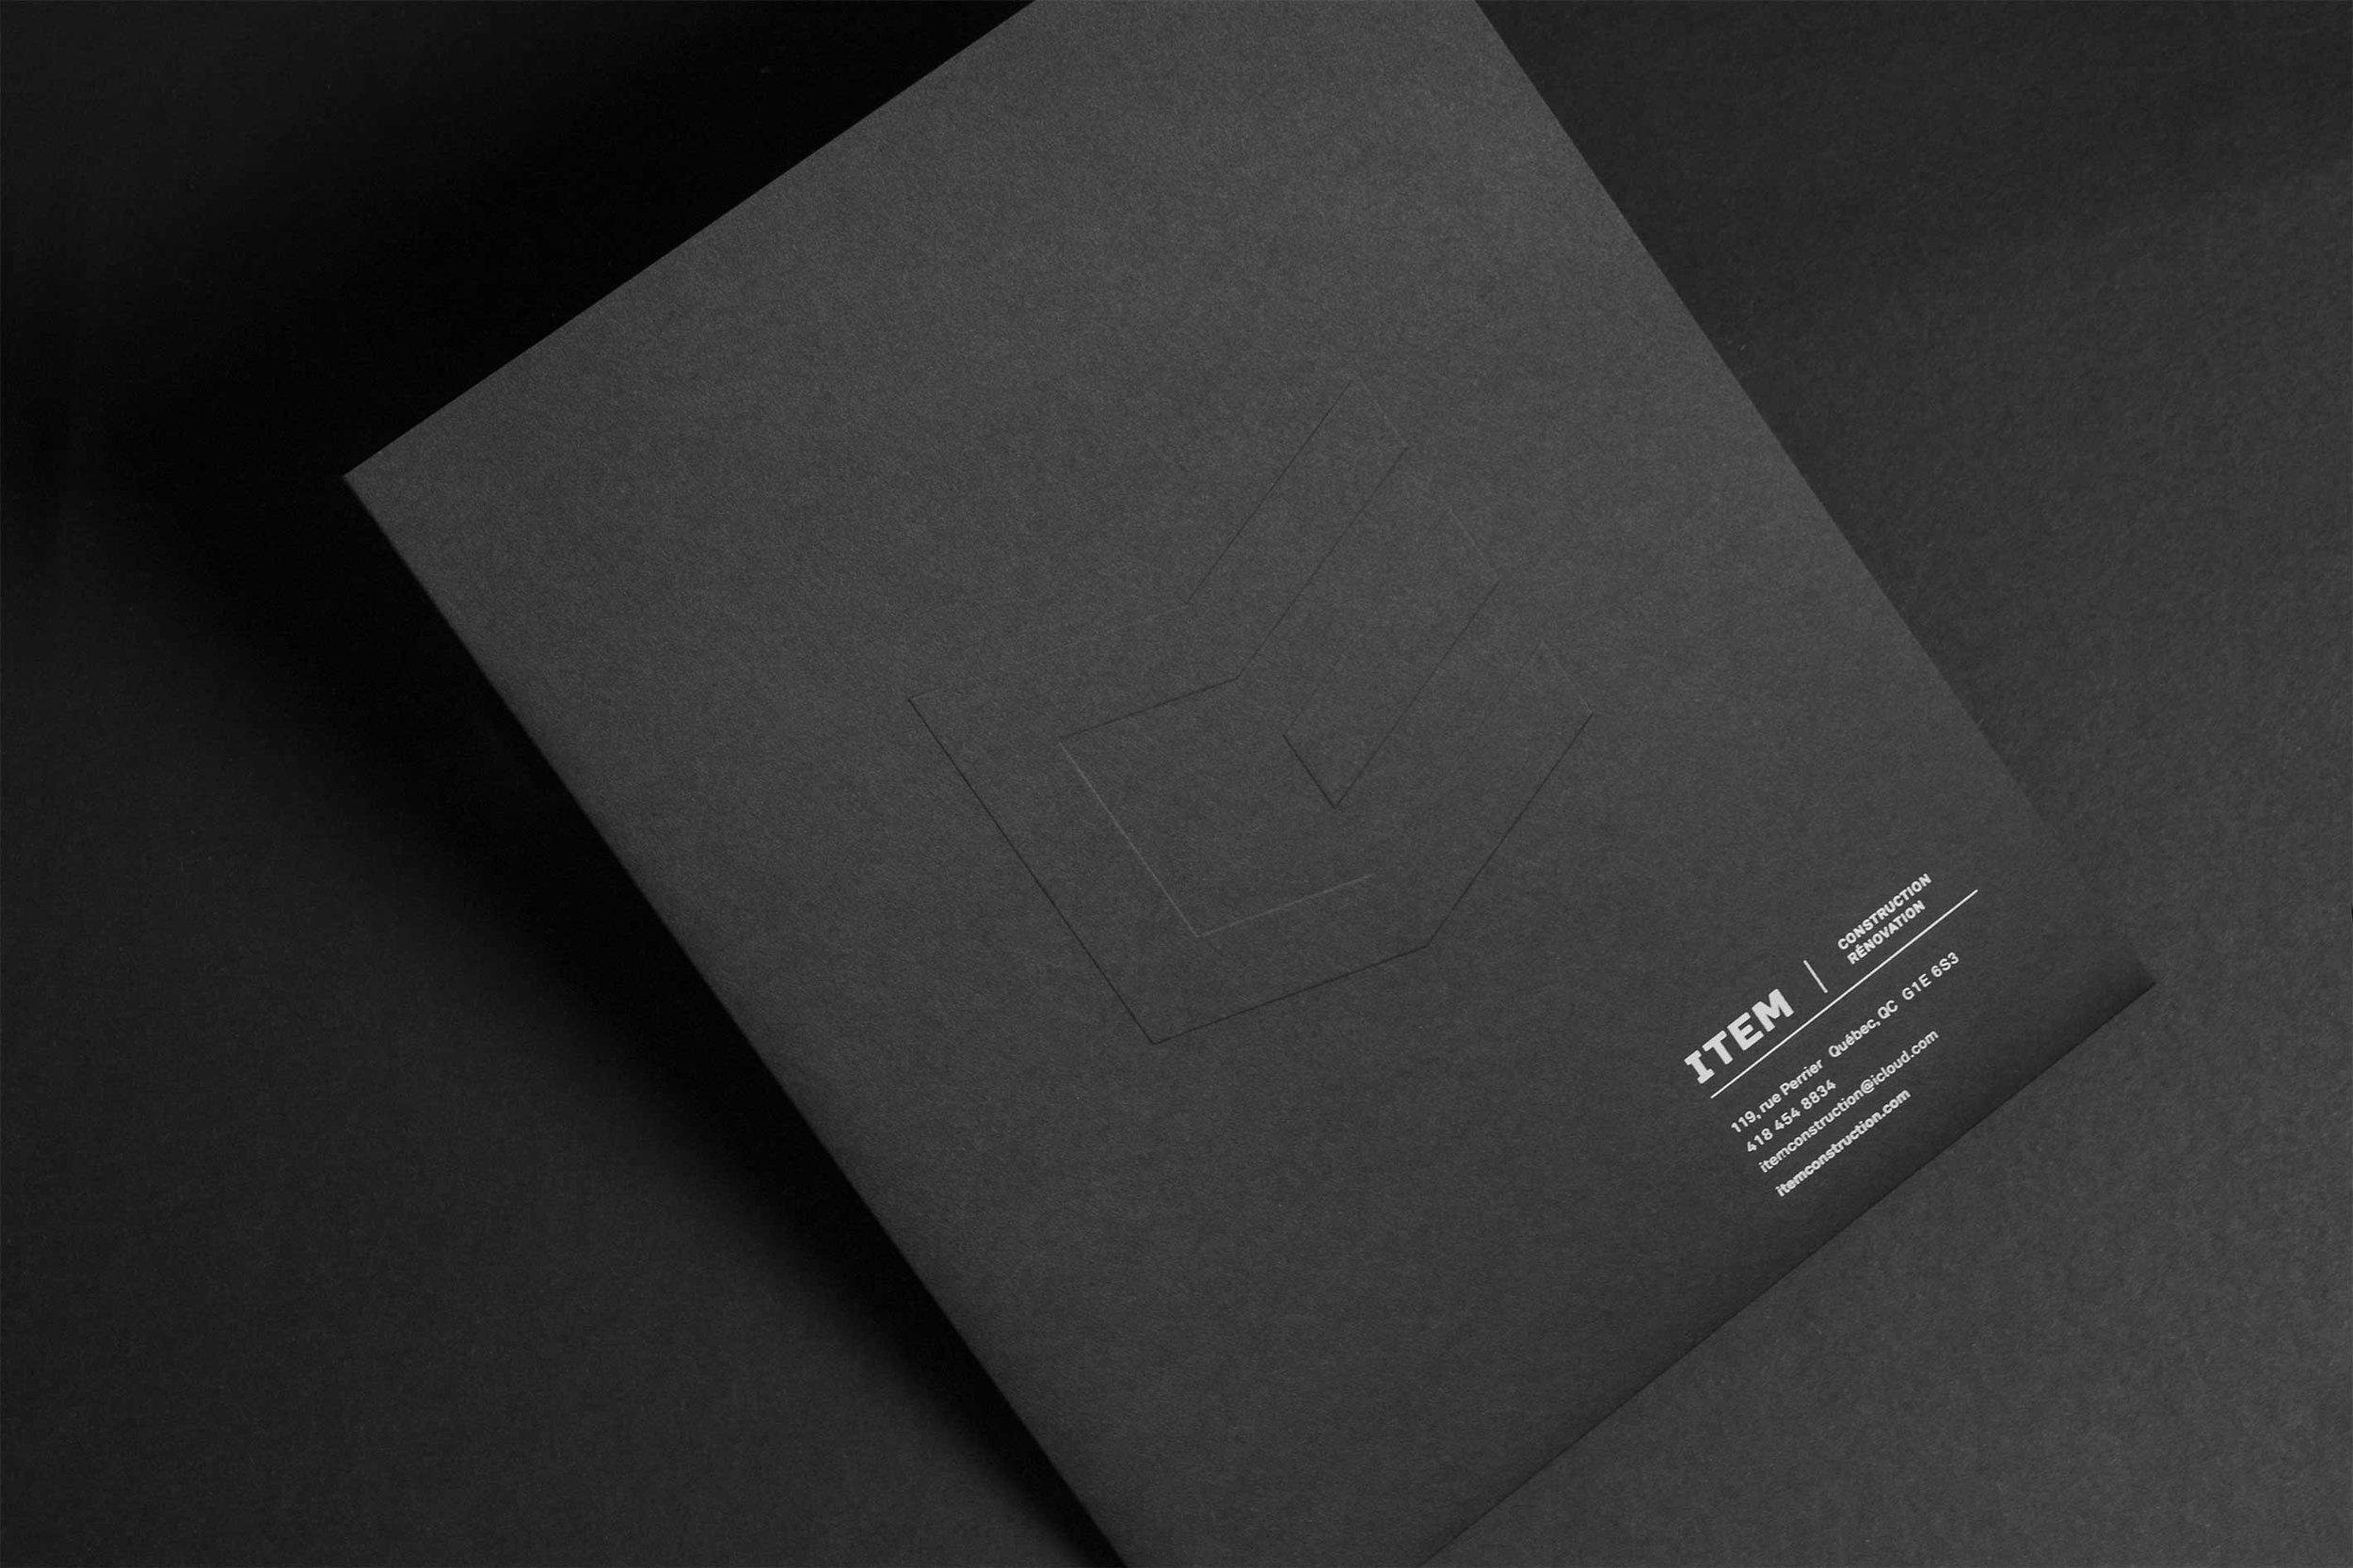 Figure-Jeremy-Hall-Design-Graphique-Quebec-Logo-Branding-Image-De-Marque-Item-Construction-13.jpg